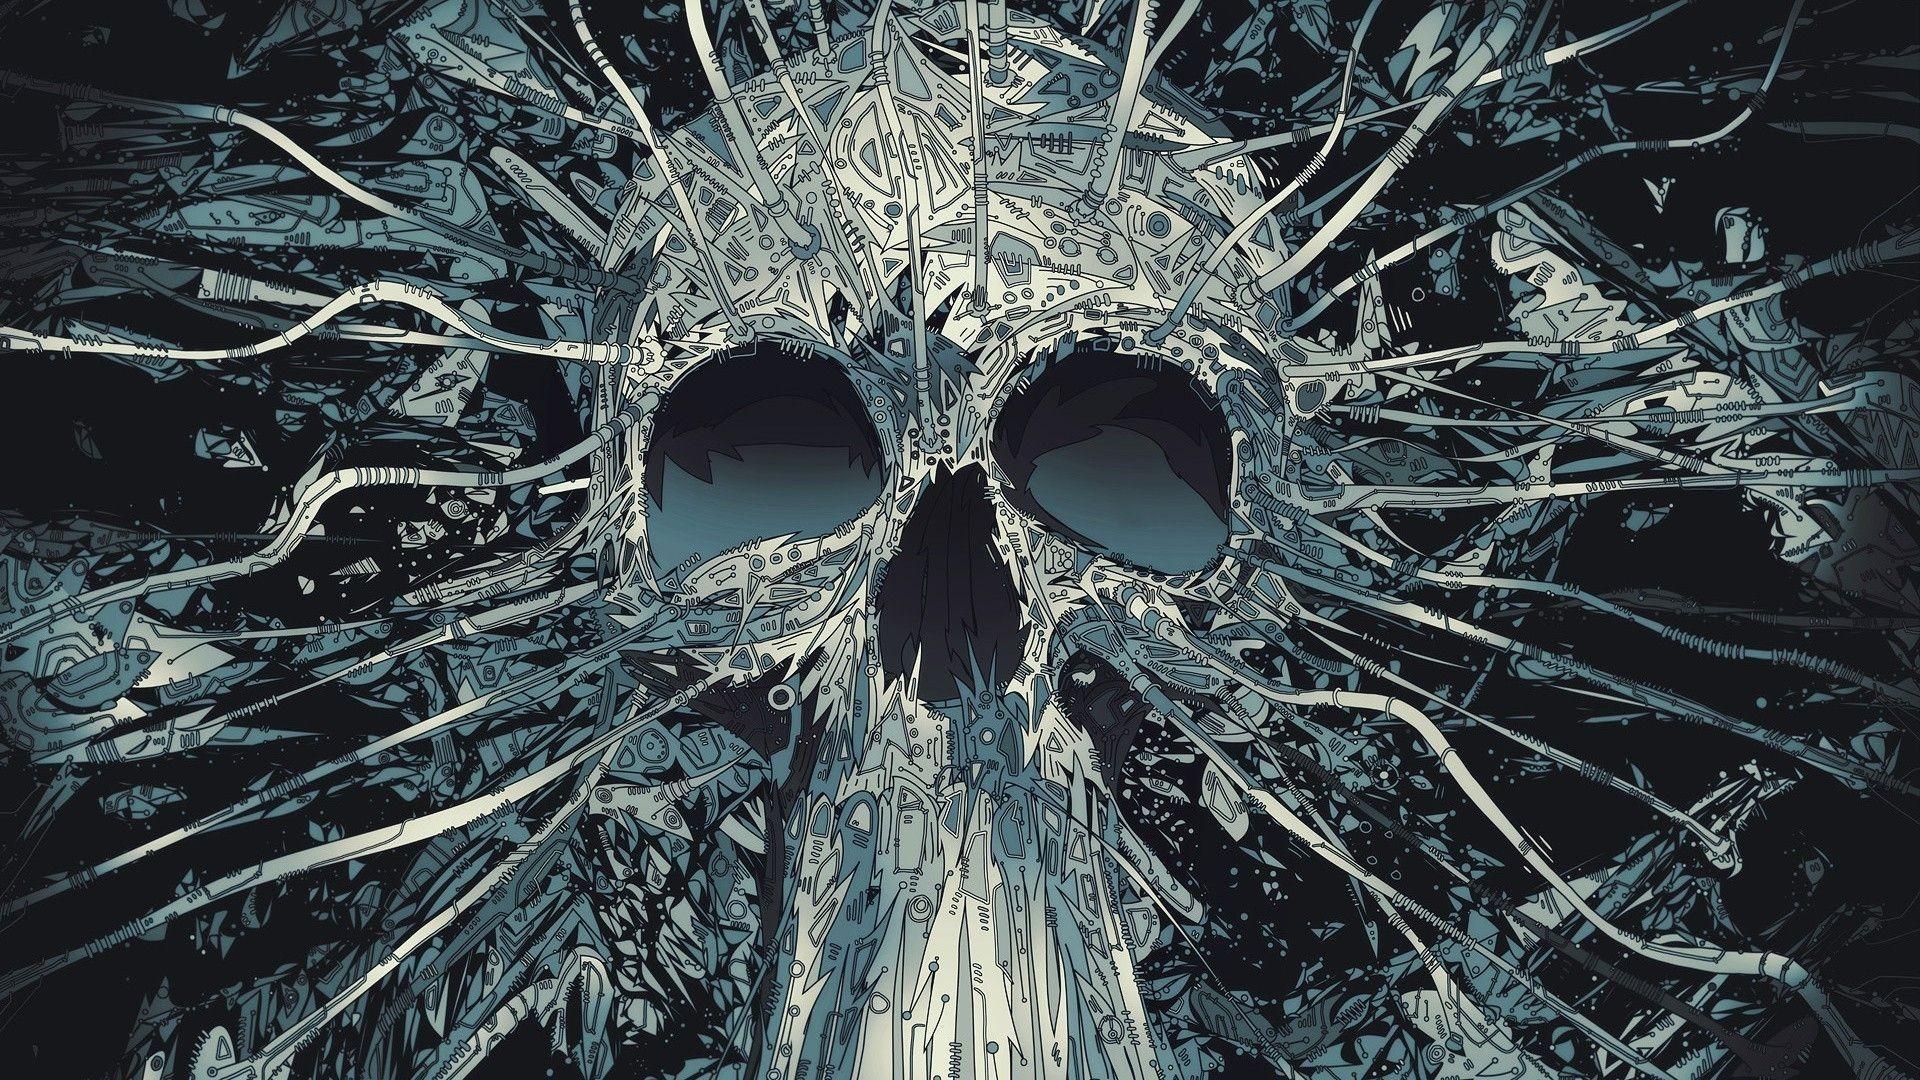 Flower Skull Backgrounds images